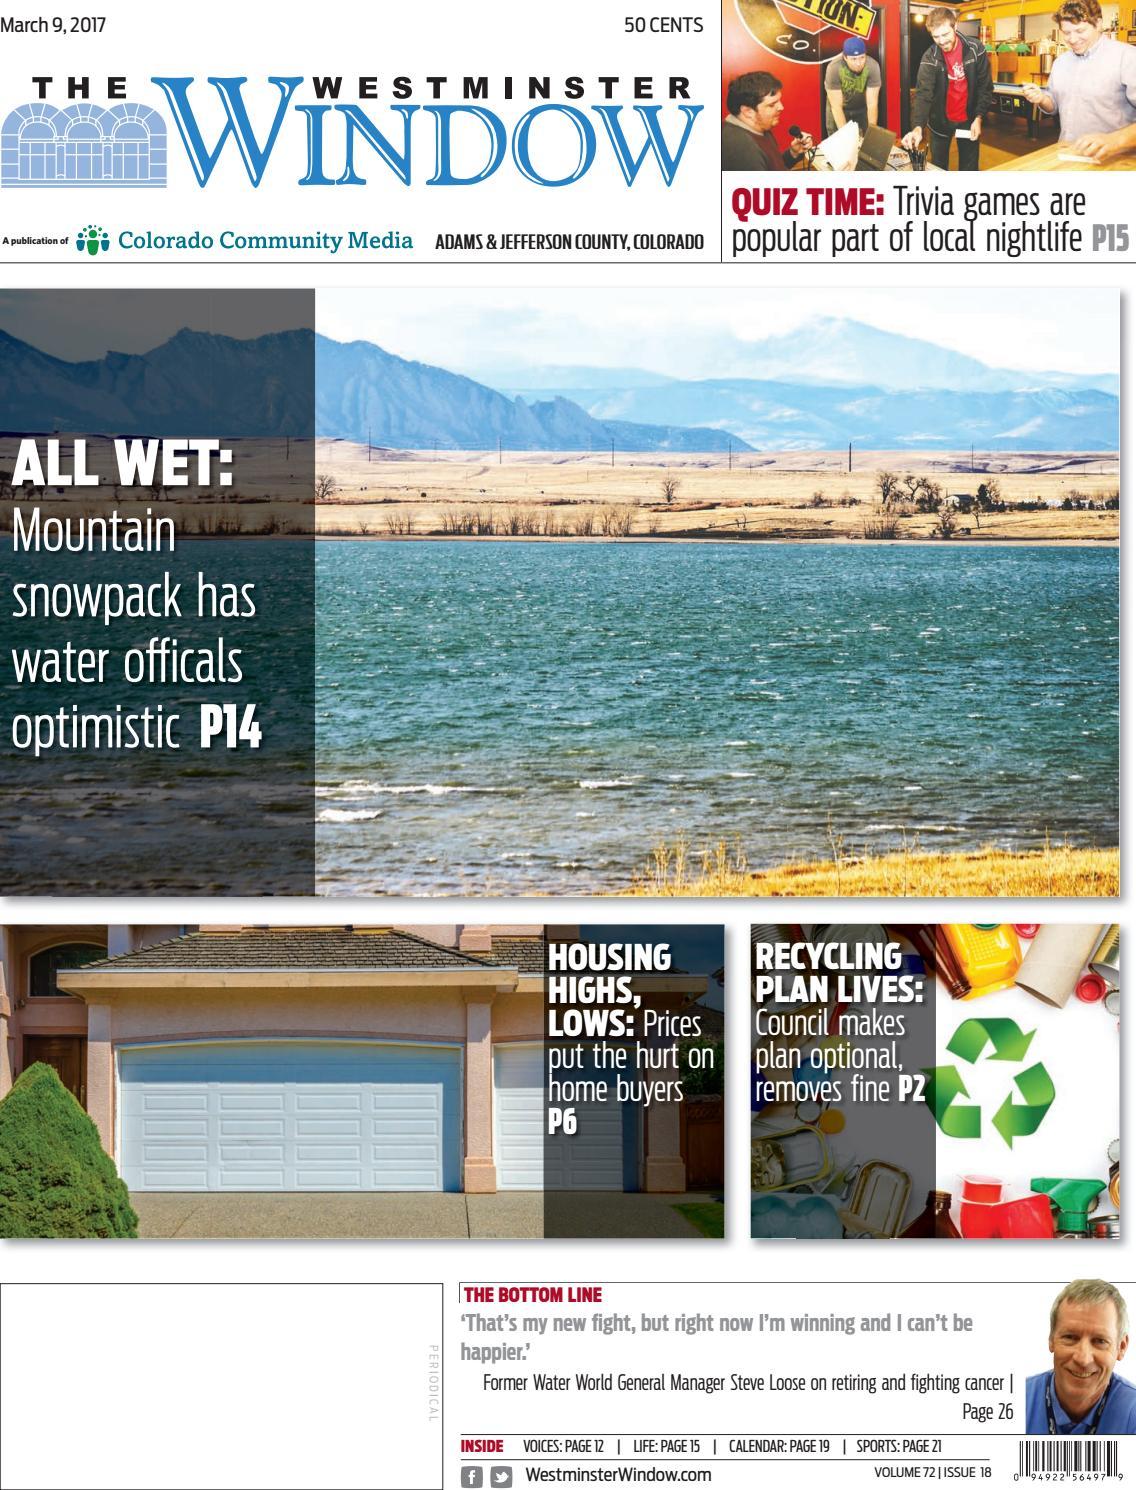 Westminster Window 0309 by Colorado Community Media - issuu